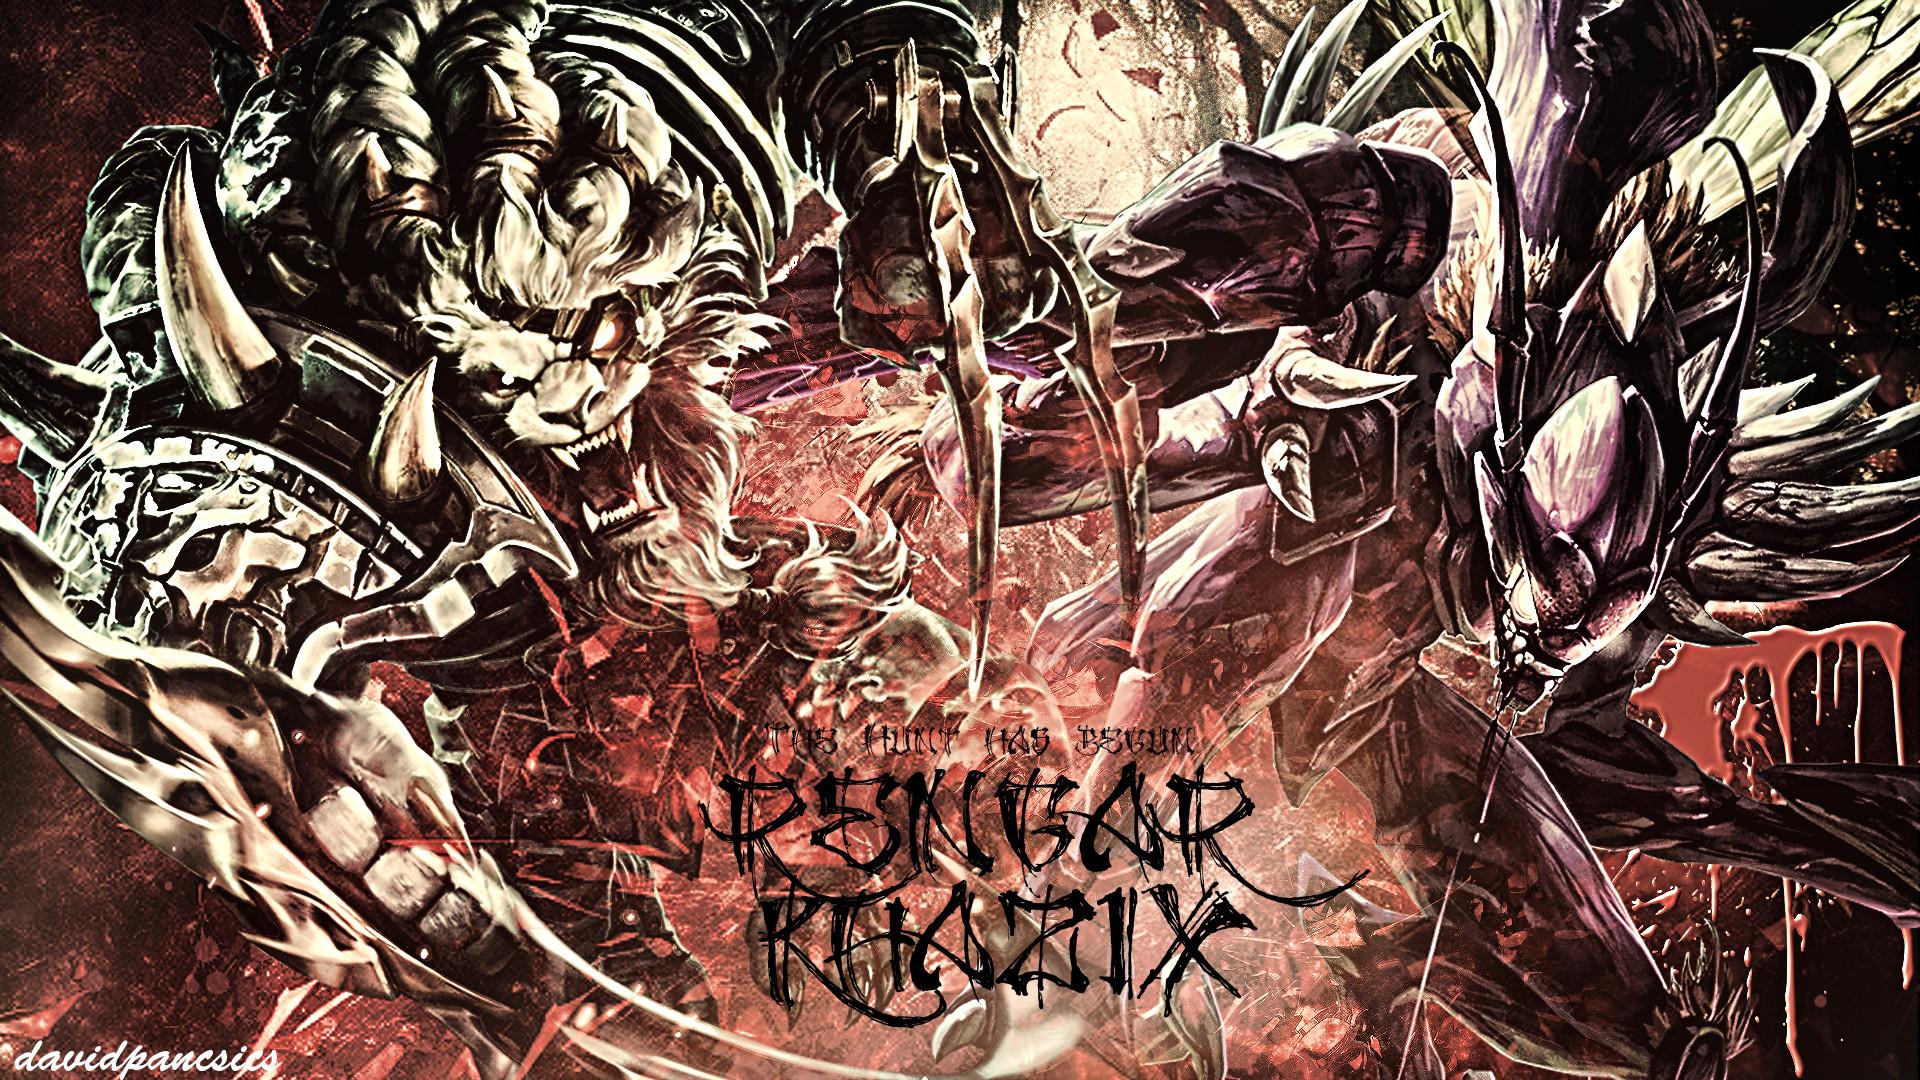 … League Of Legends – Rengar VS Kha'Zix wallpaper by pancsicsdavid